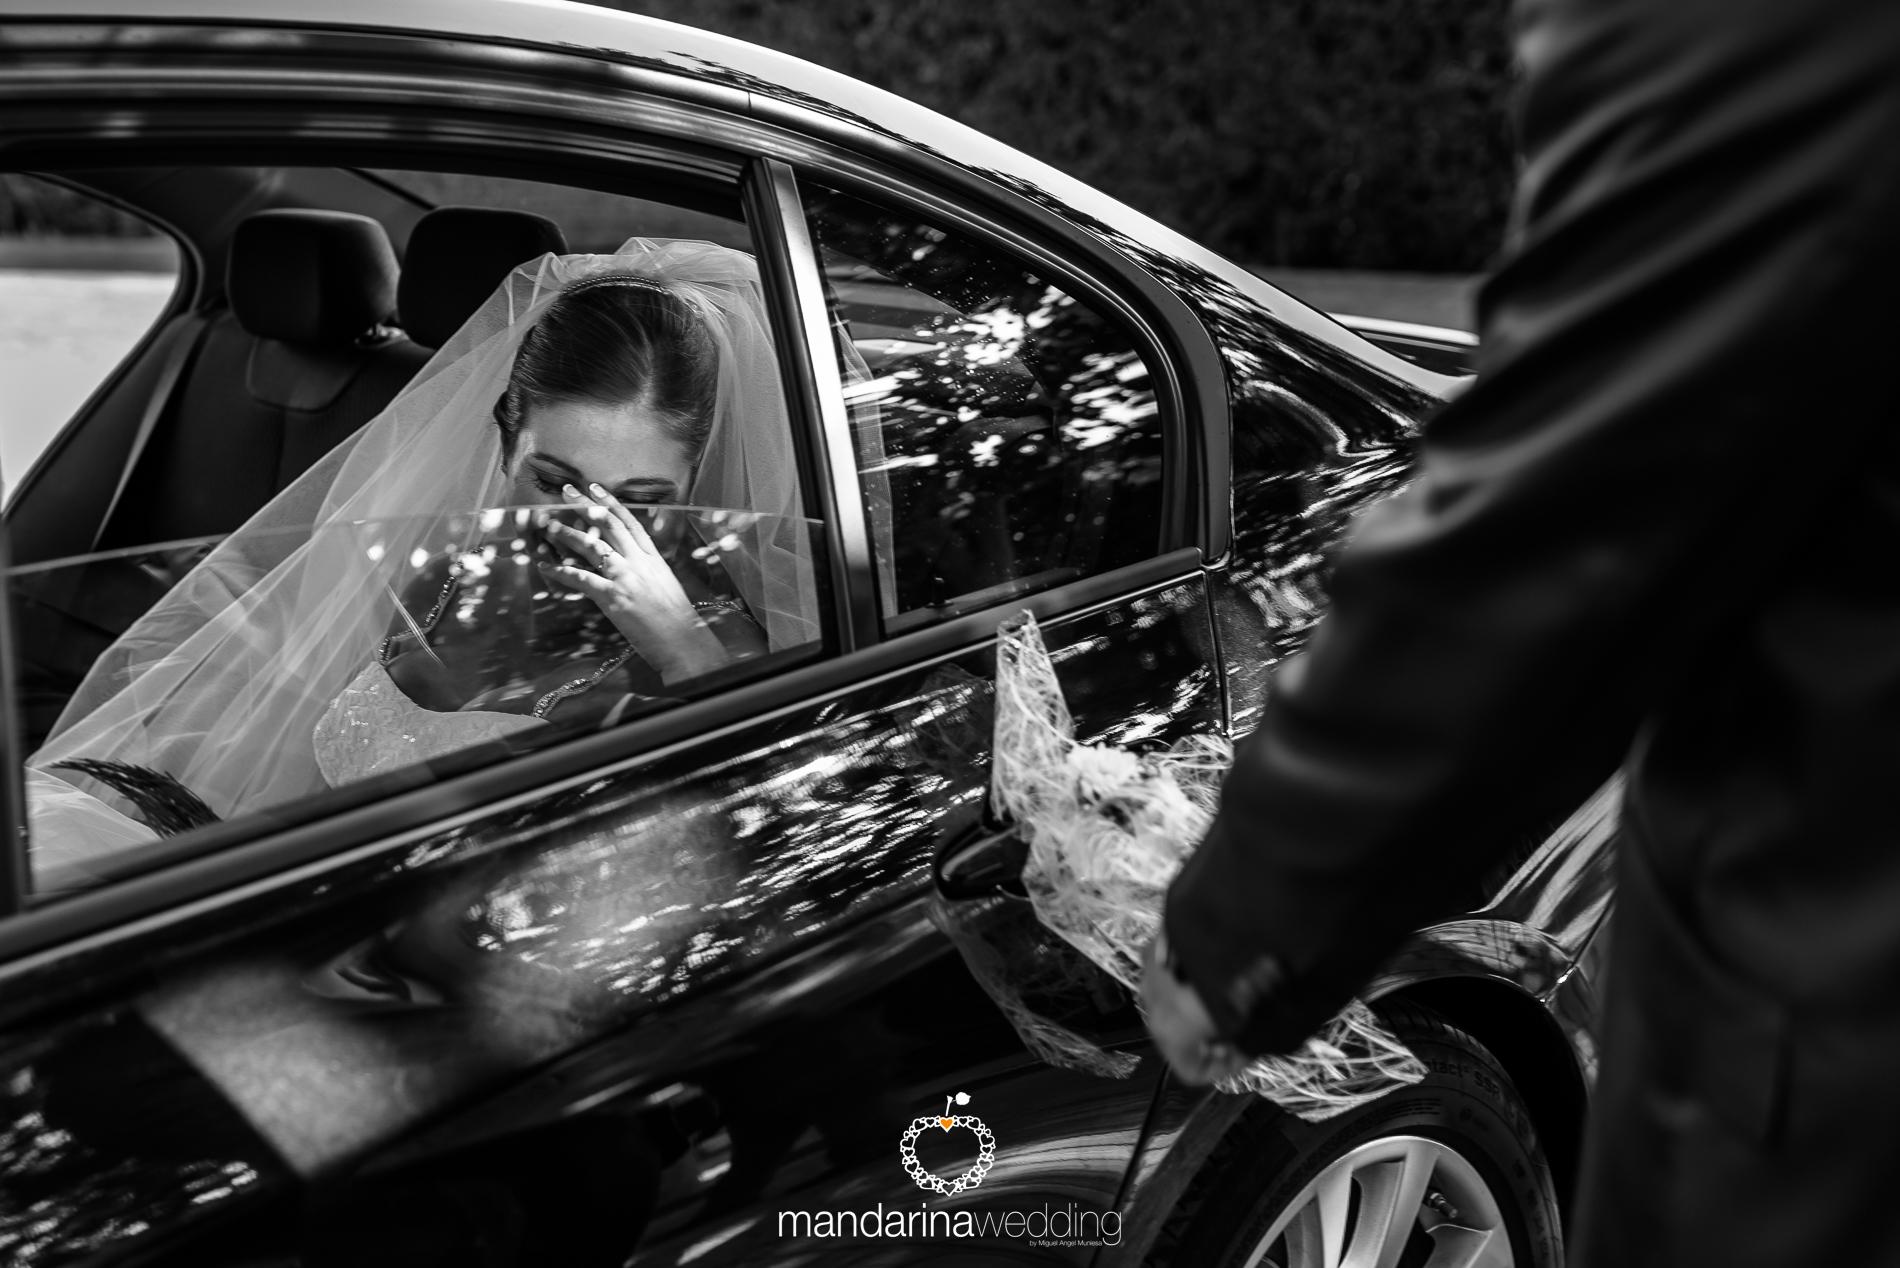 mandarina wedding, mejores fotografos boda, fotografo zaragoza, fotografo huesca, fotografo soria, fotografo lerida_31